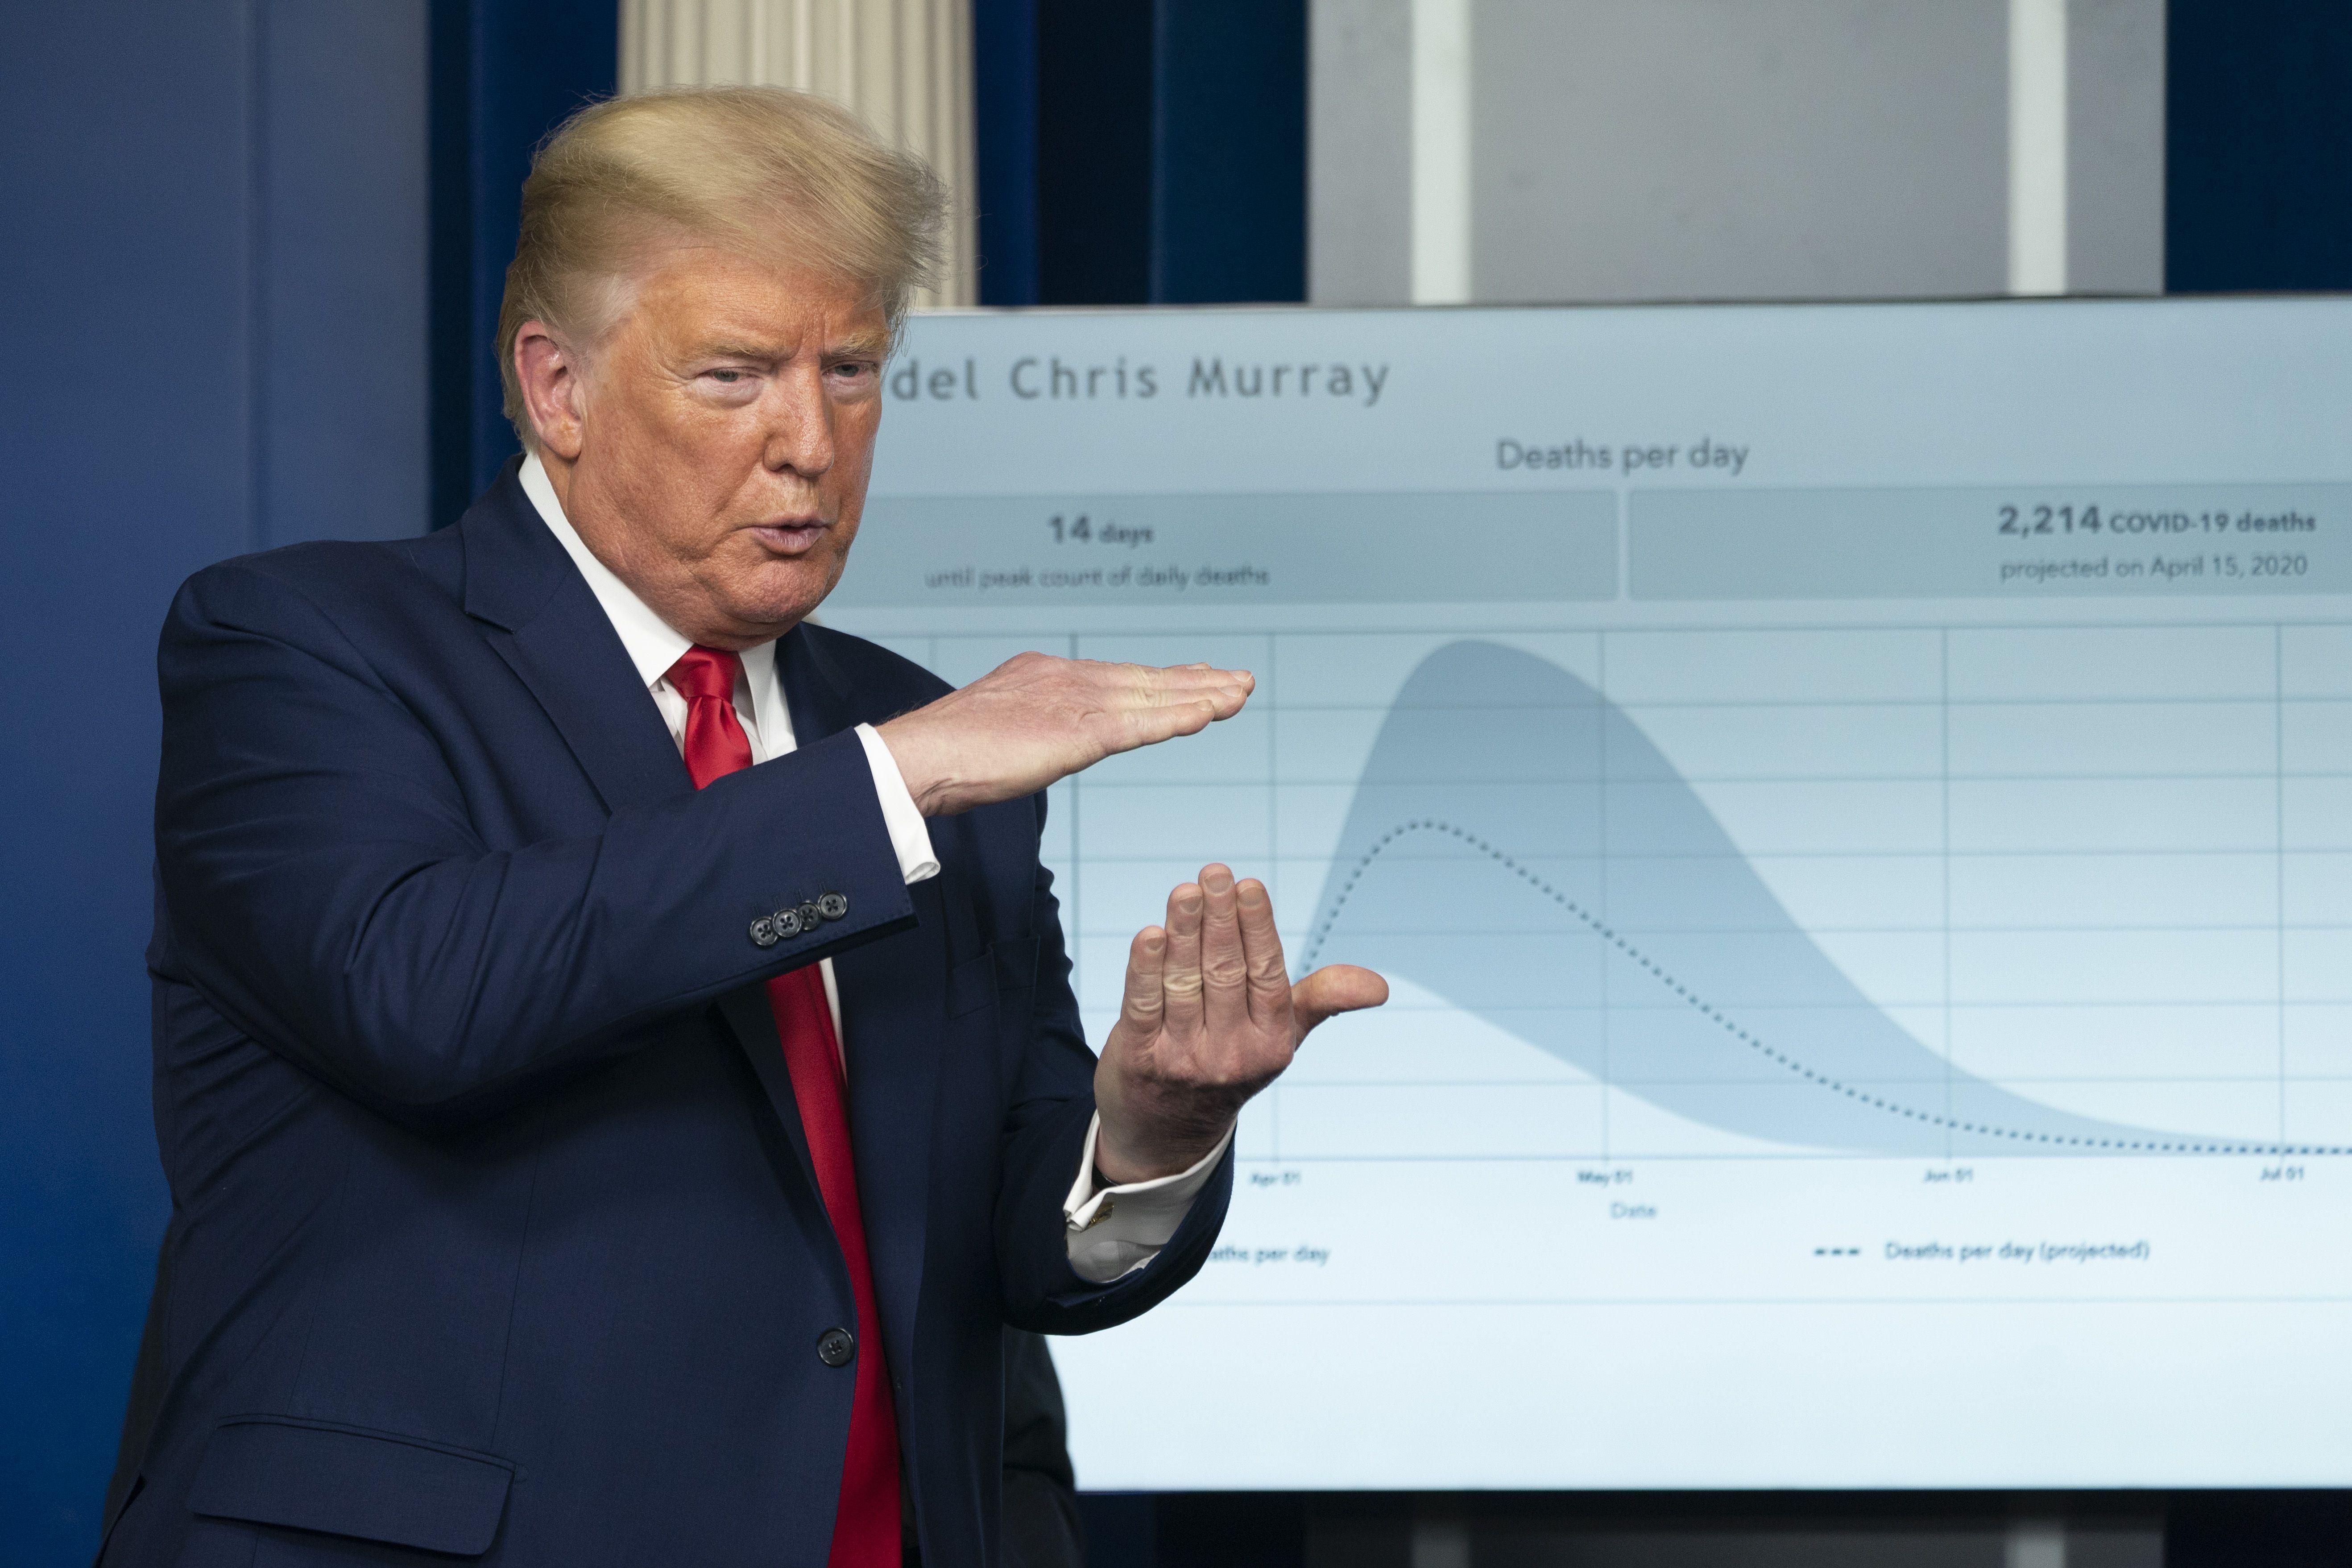 """A very, very painful 2 weeks"": Trump's new dark, dire coronavirus outlook"